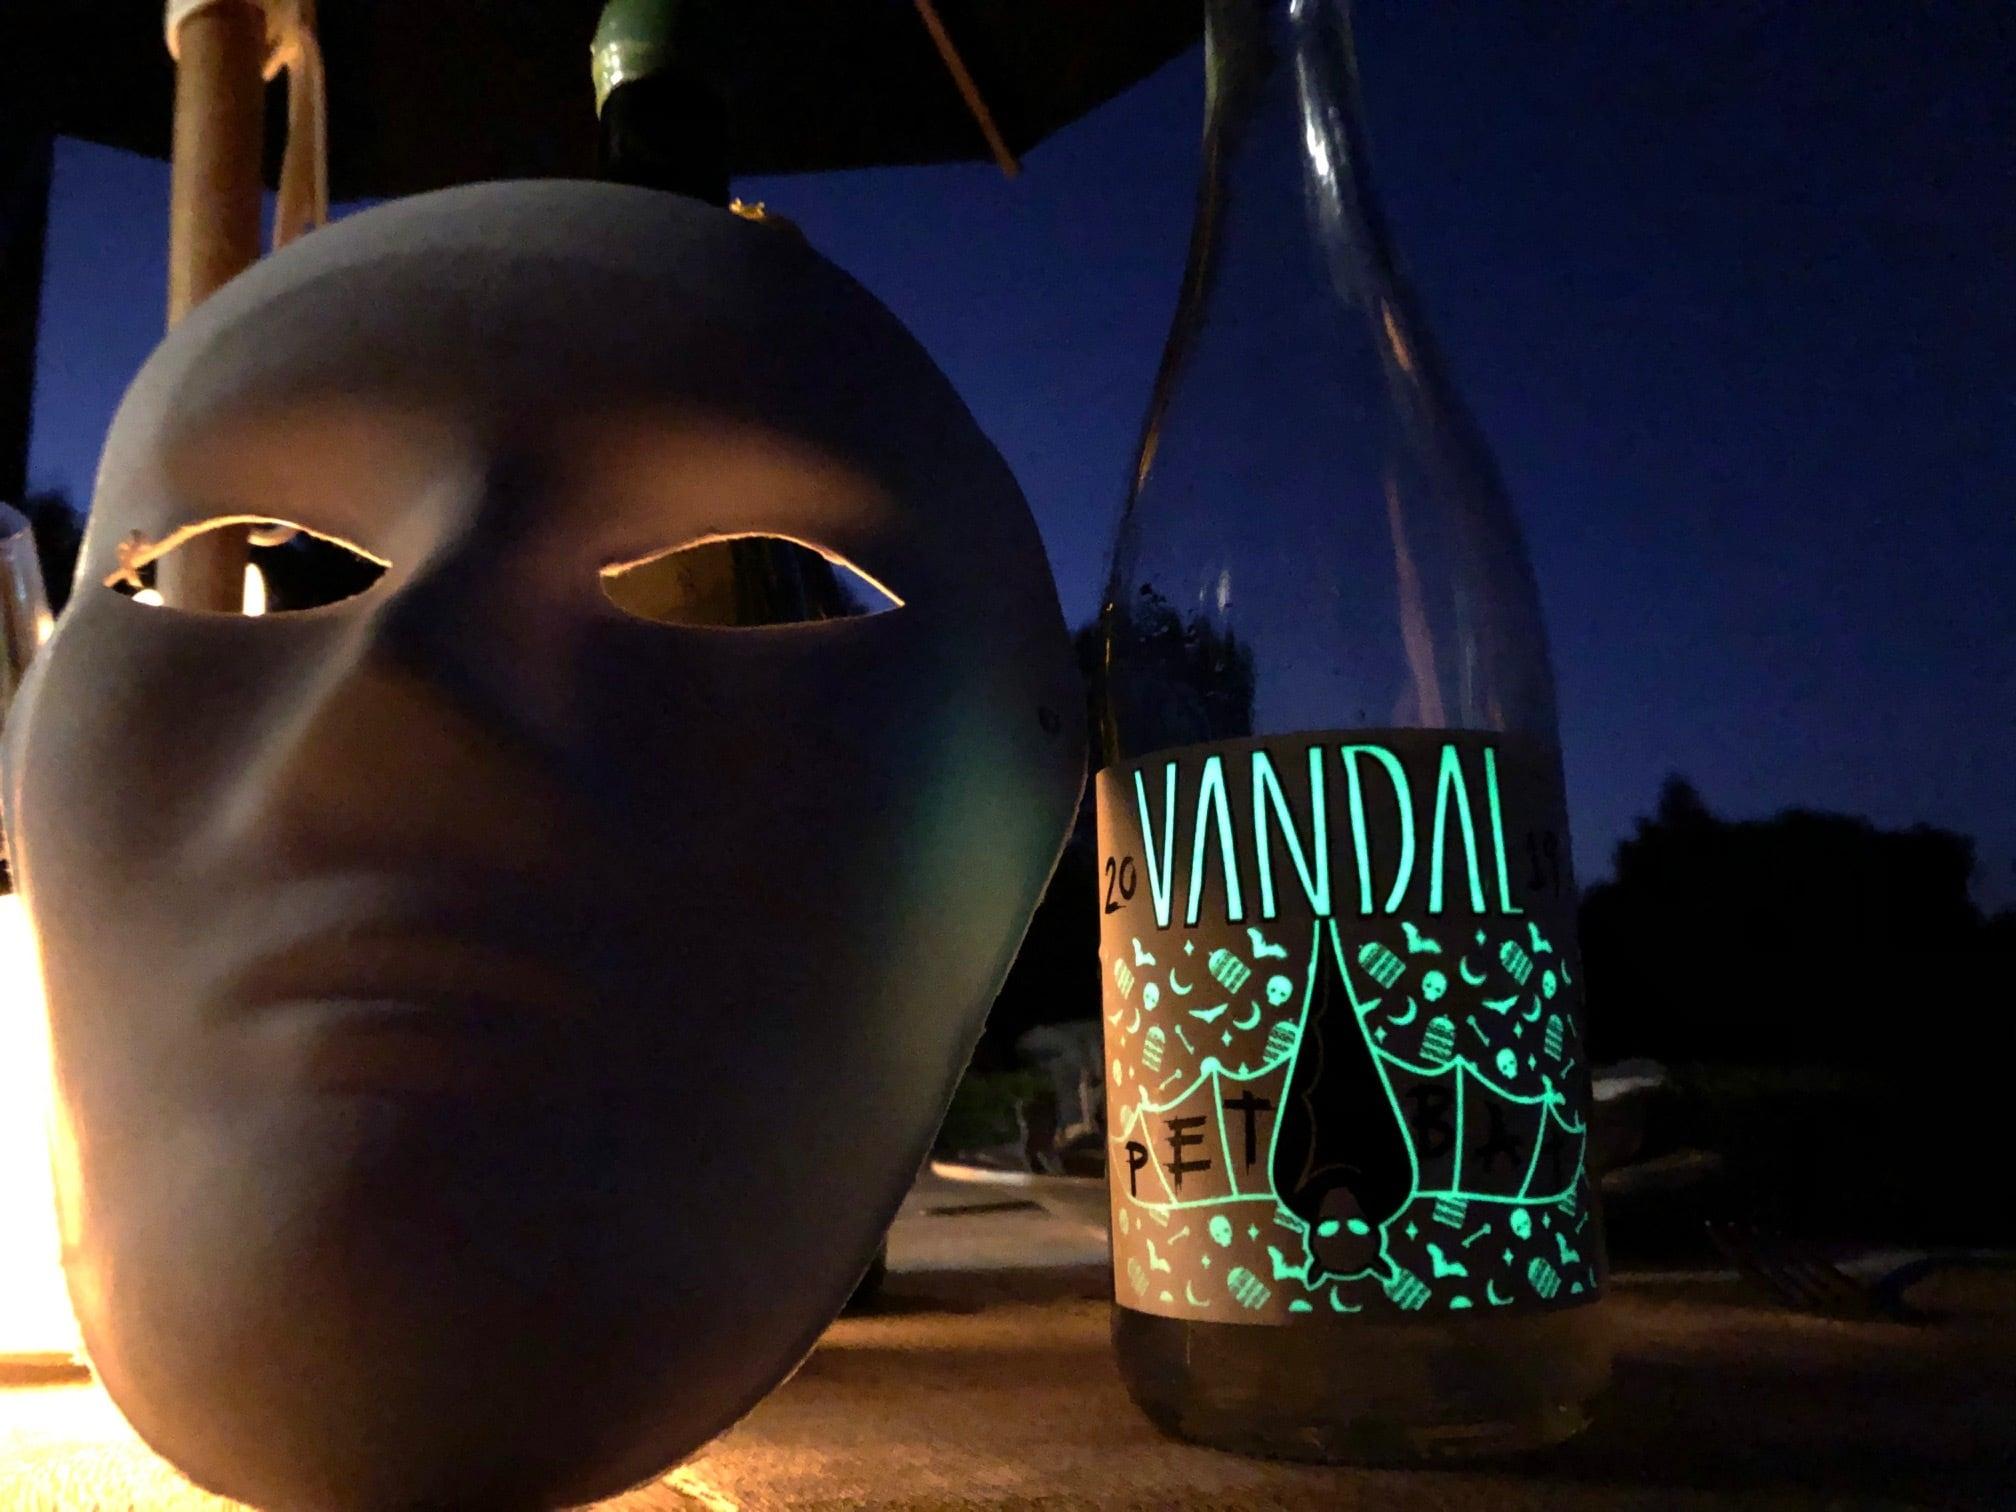 Vandal Gonzo Pet-Bat 2020 / ヴァンダル ゴンゾー ペットバット